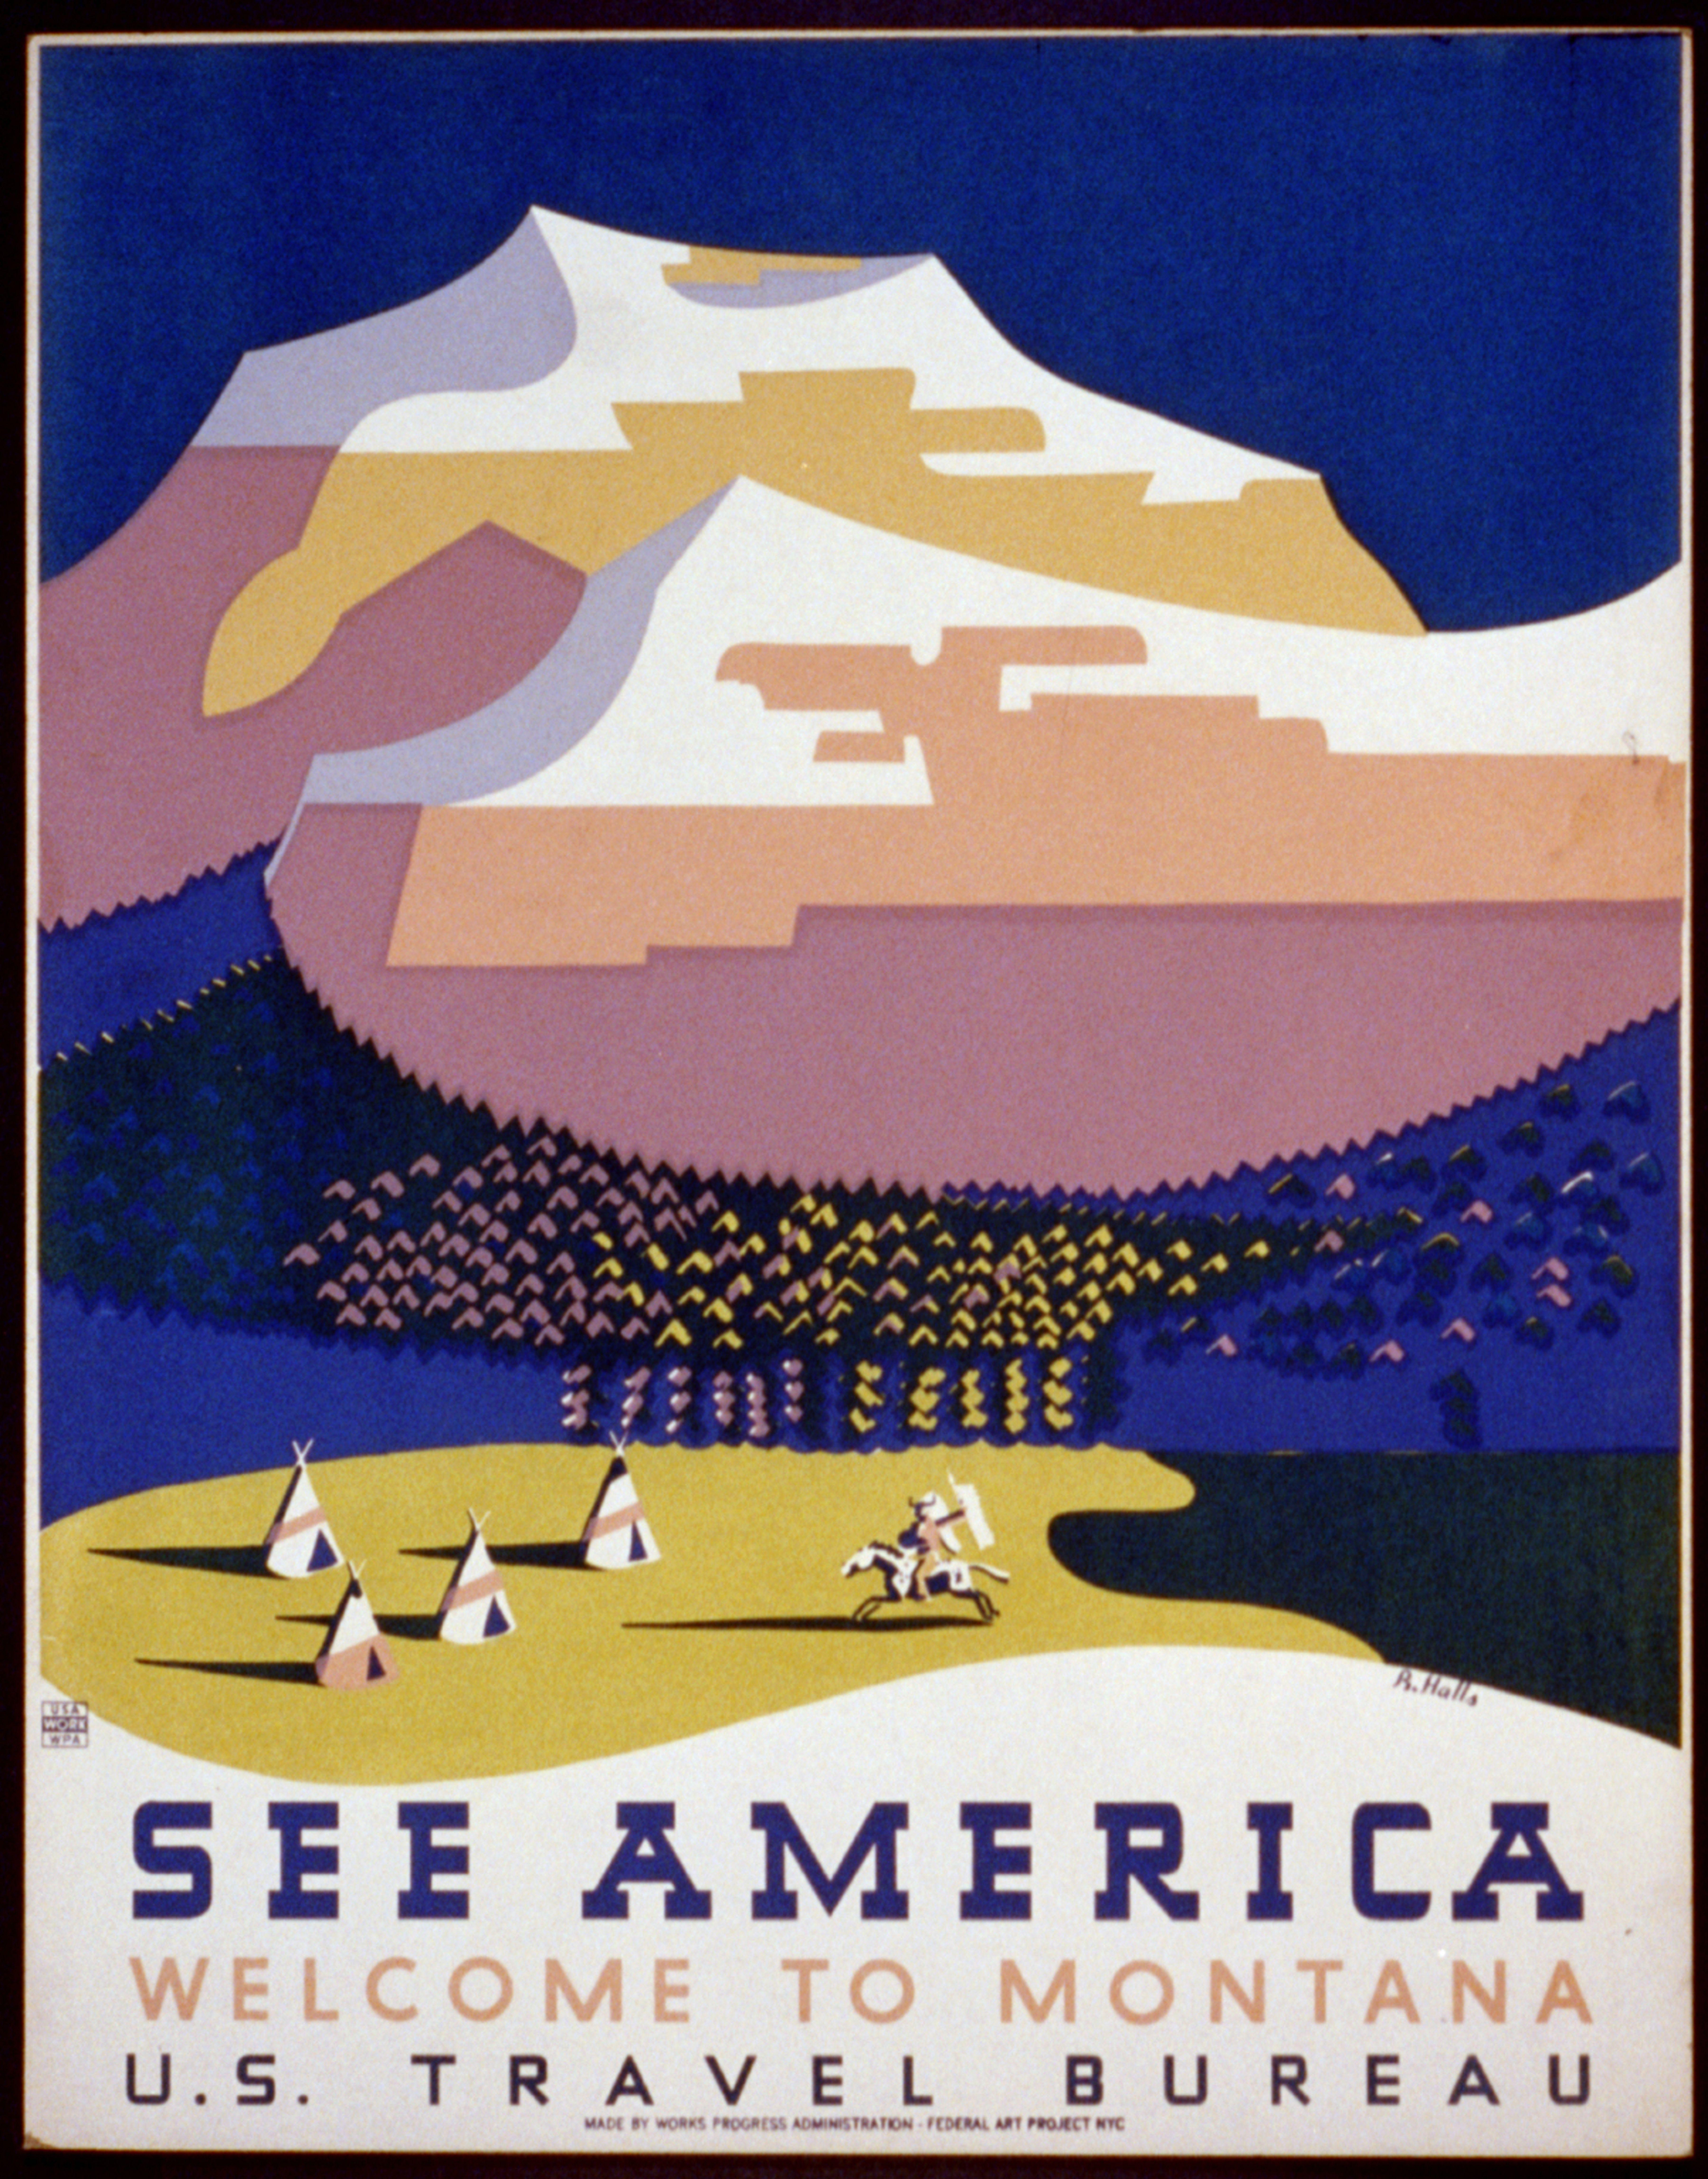 U.S. Travel Bureau Poster, 1936-1938